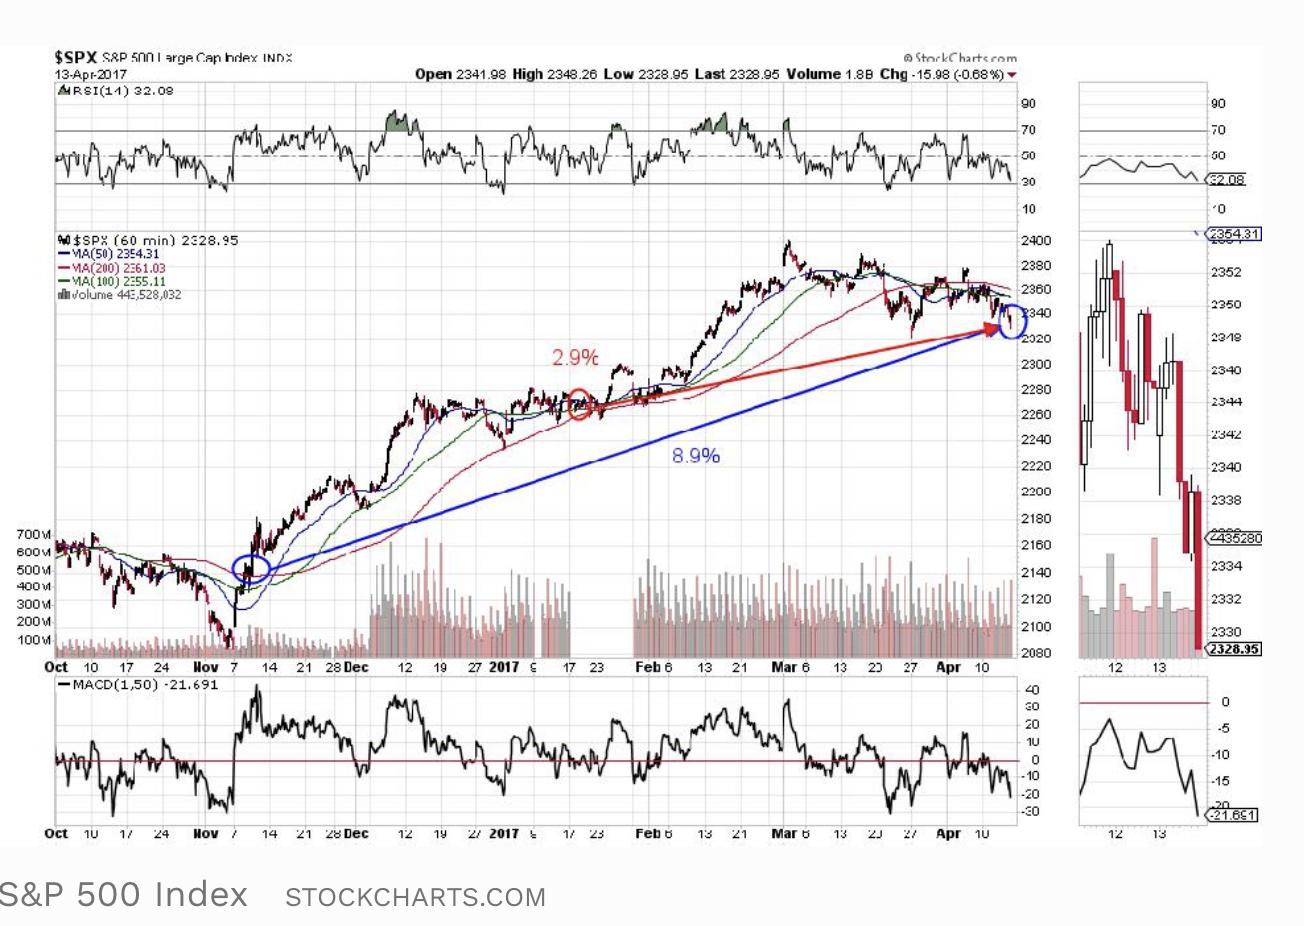 Screen-Shot-2021-04-19-at-3.31.52-PM Stock Market Under Biden Surges Past Trump As GOP Implodes Economy Featured Politics Stock Market Top Stories